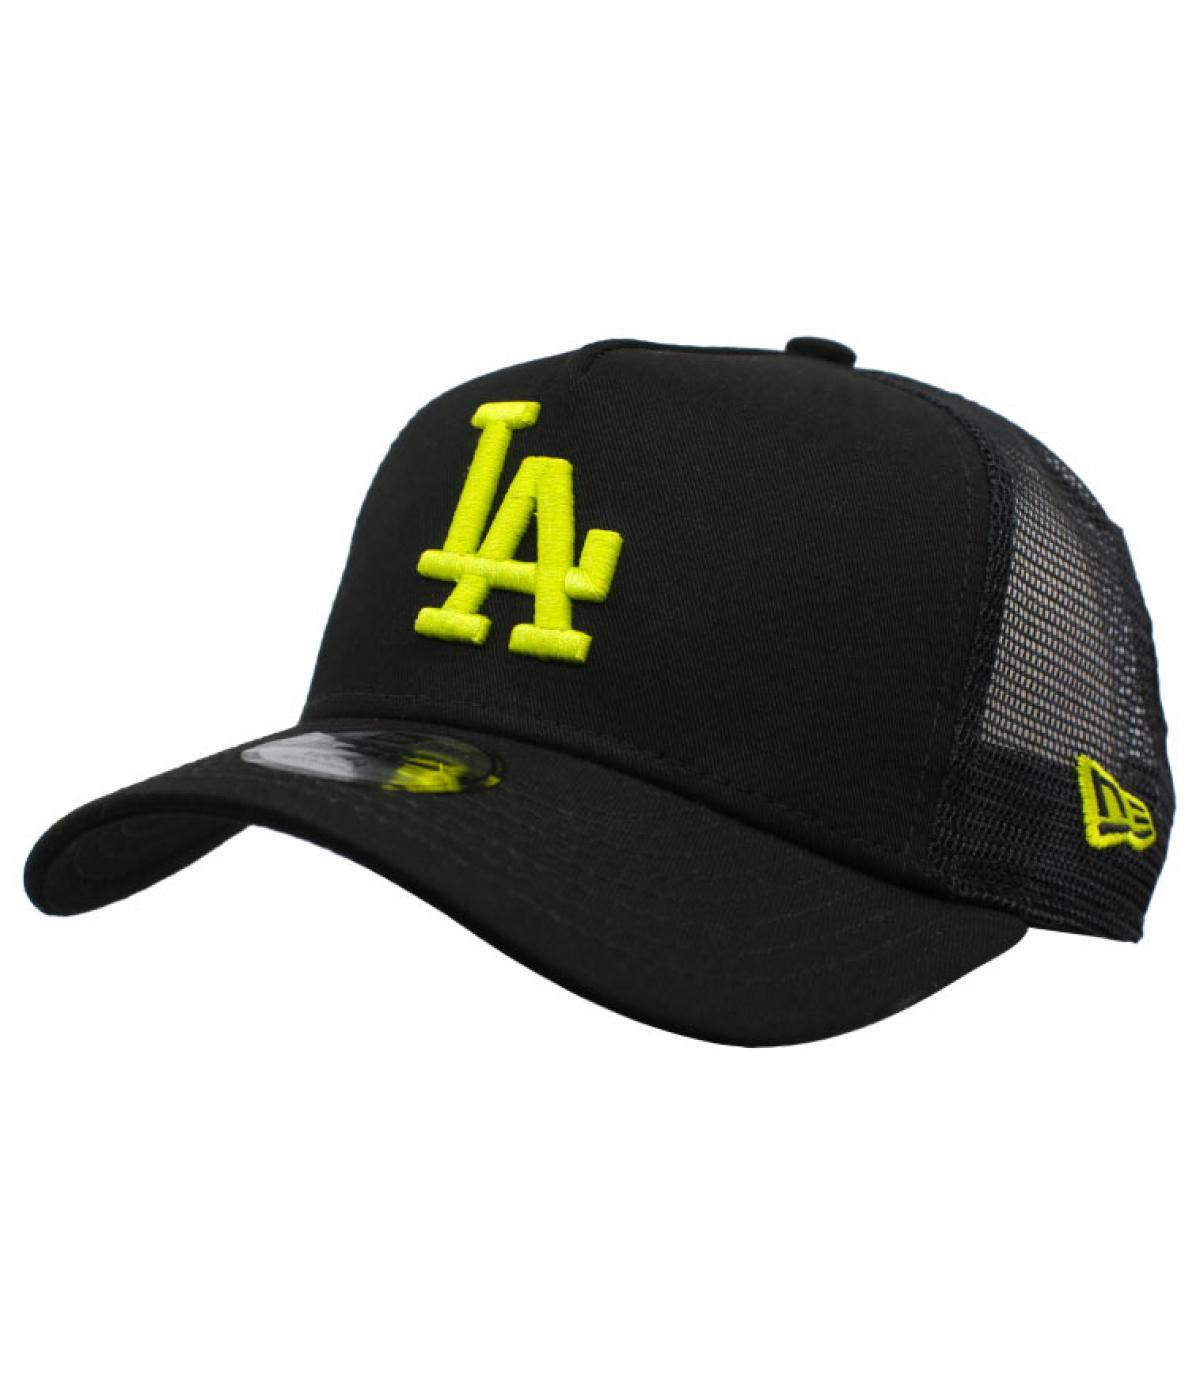 black yellow LA child trucker